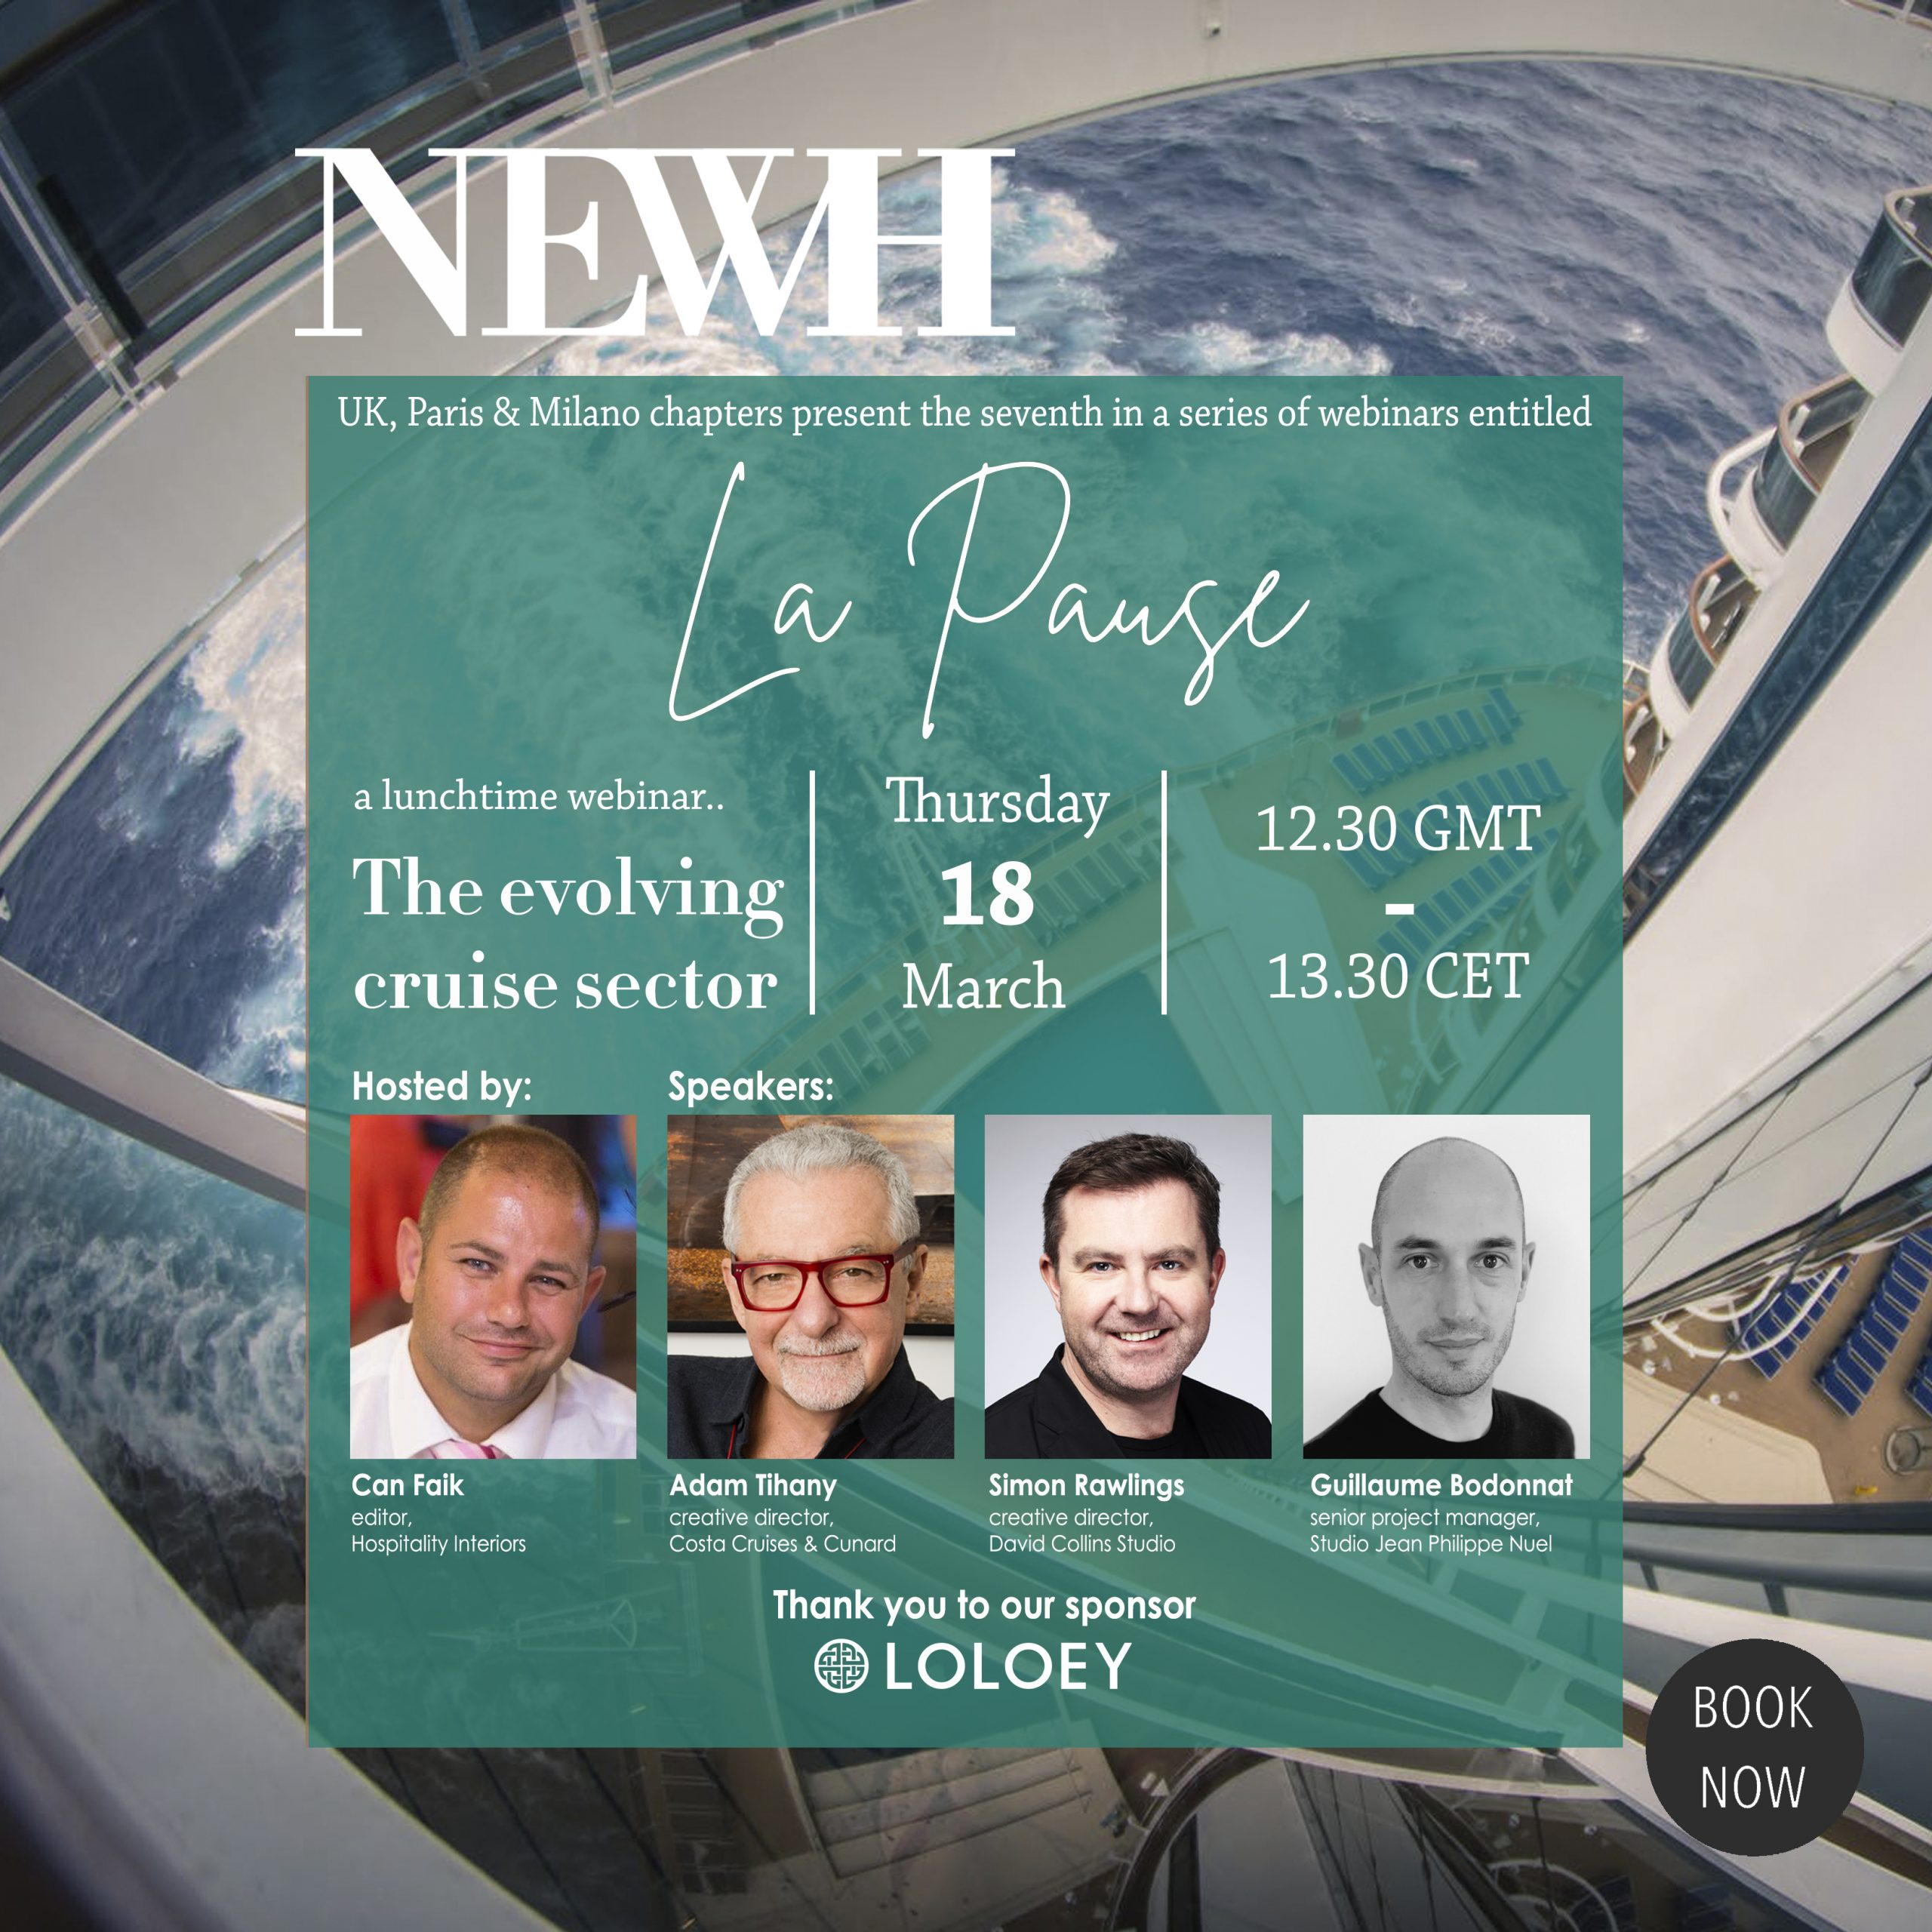 NEWH La pause webinar